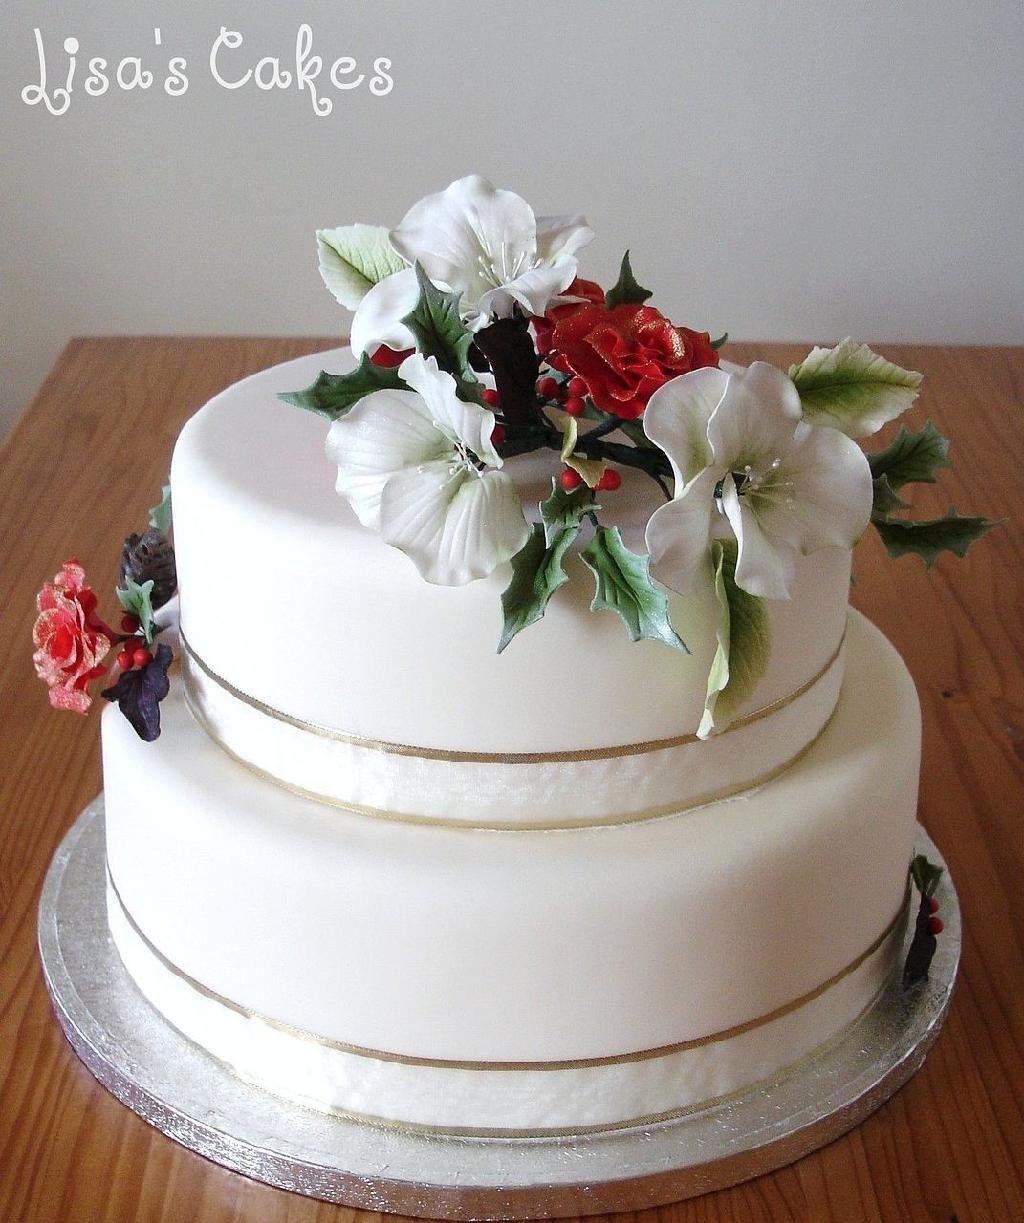 Wix.com | Christmas wedding cakes, Christmas wedding and Wedding cake